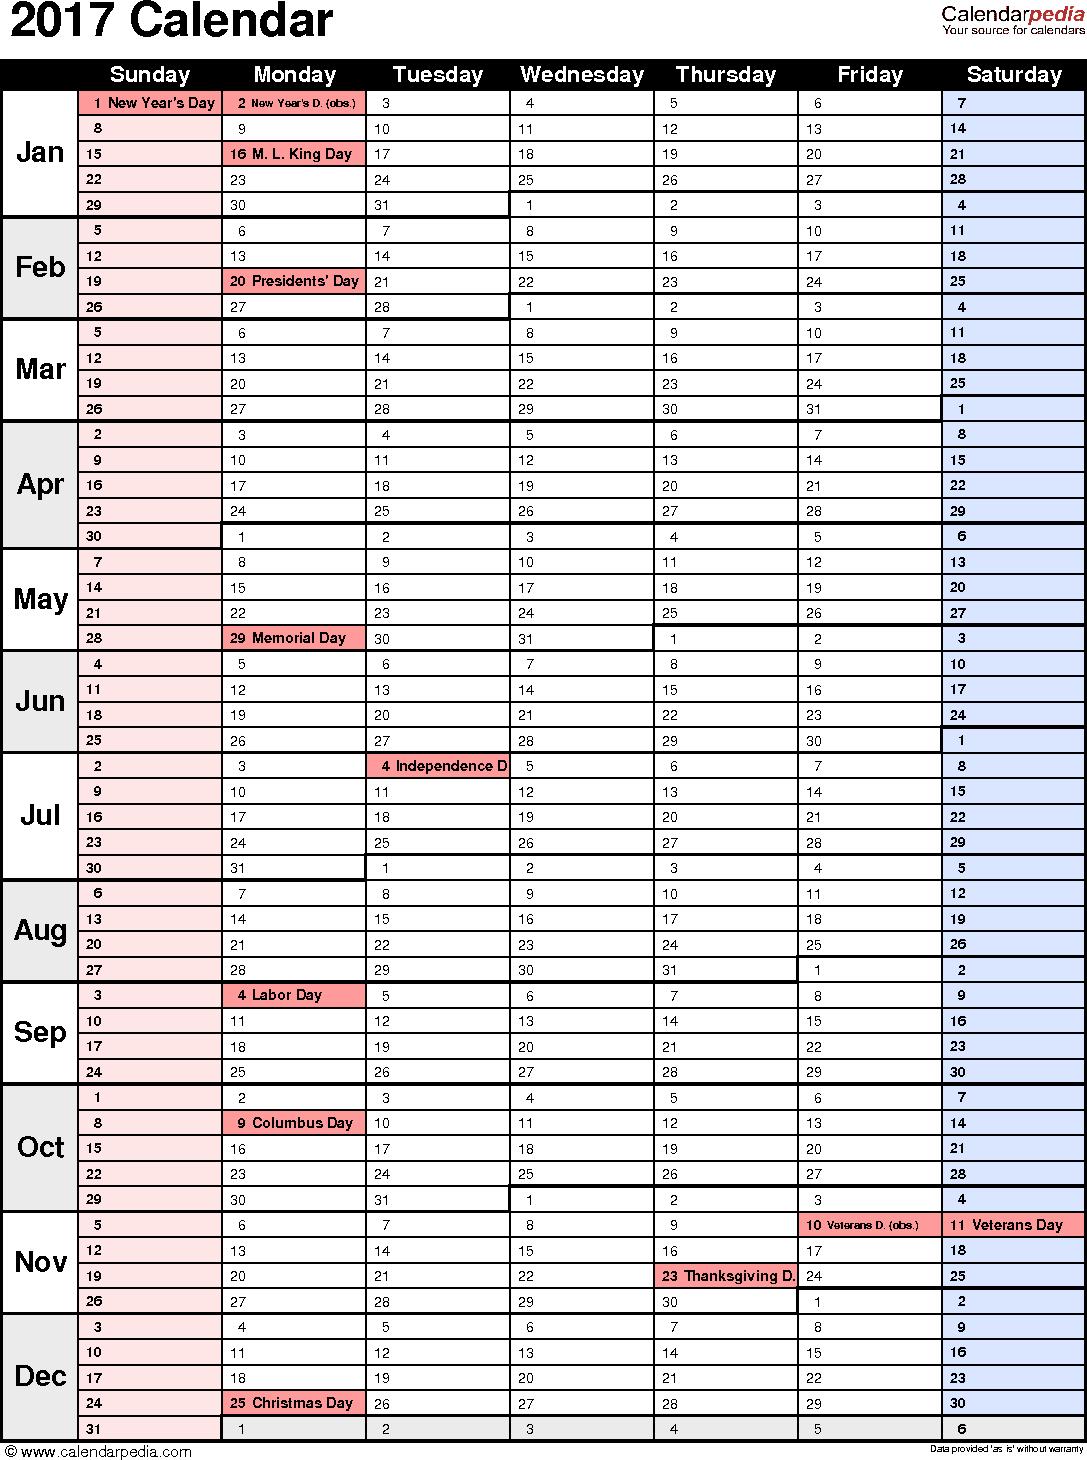 2017 Calendar - Download 17 free printable Excel templates (.xls)